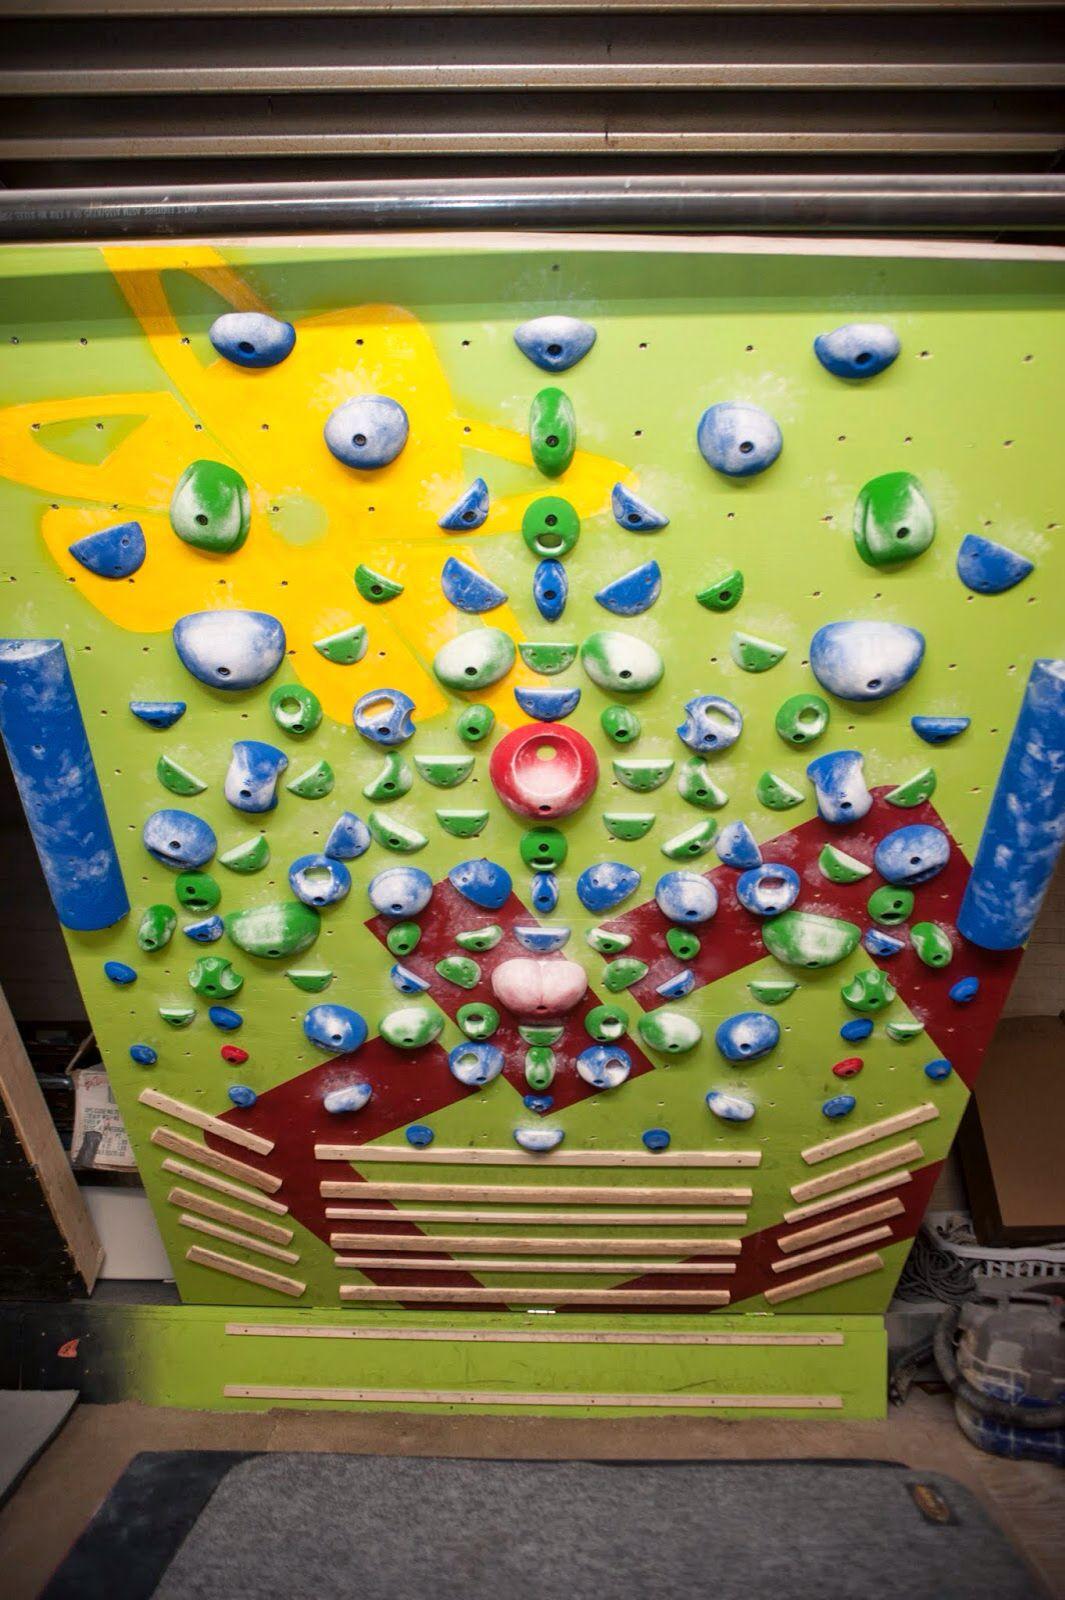 System wall climbing | Bouldering Walls | Pinterest | Walls, Wall ...